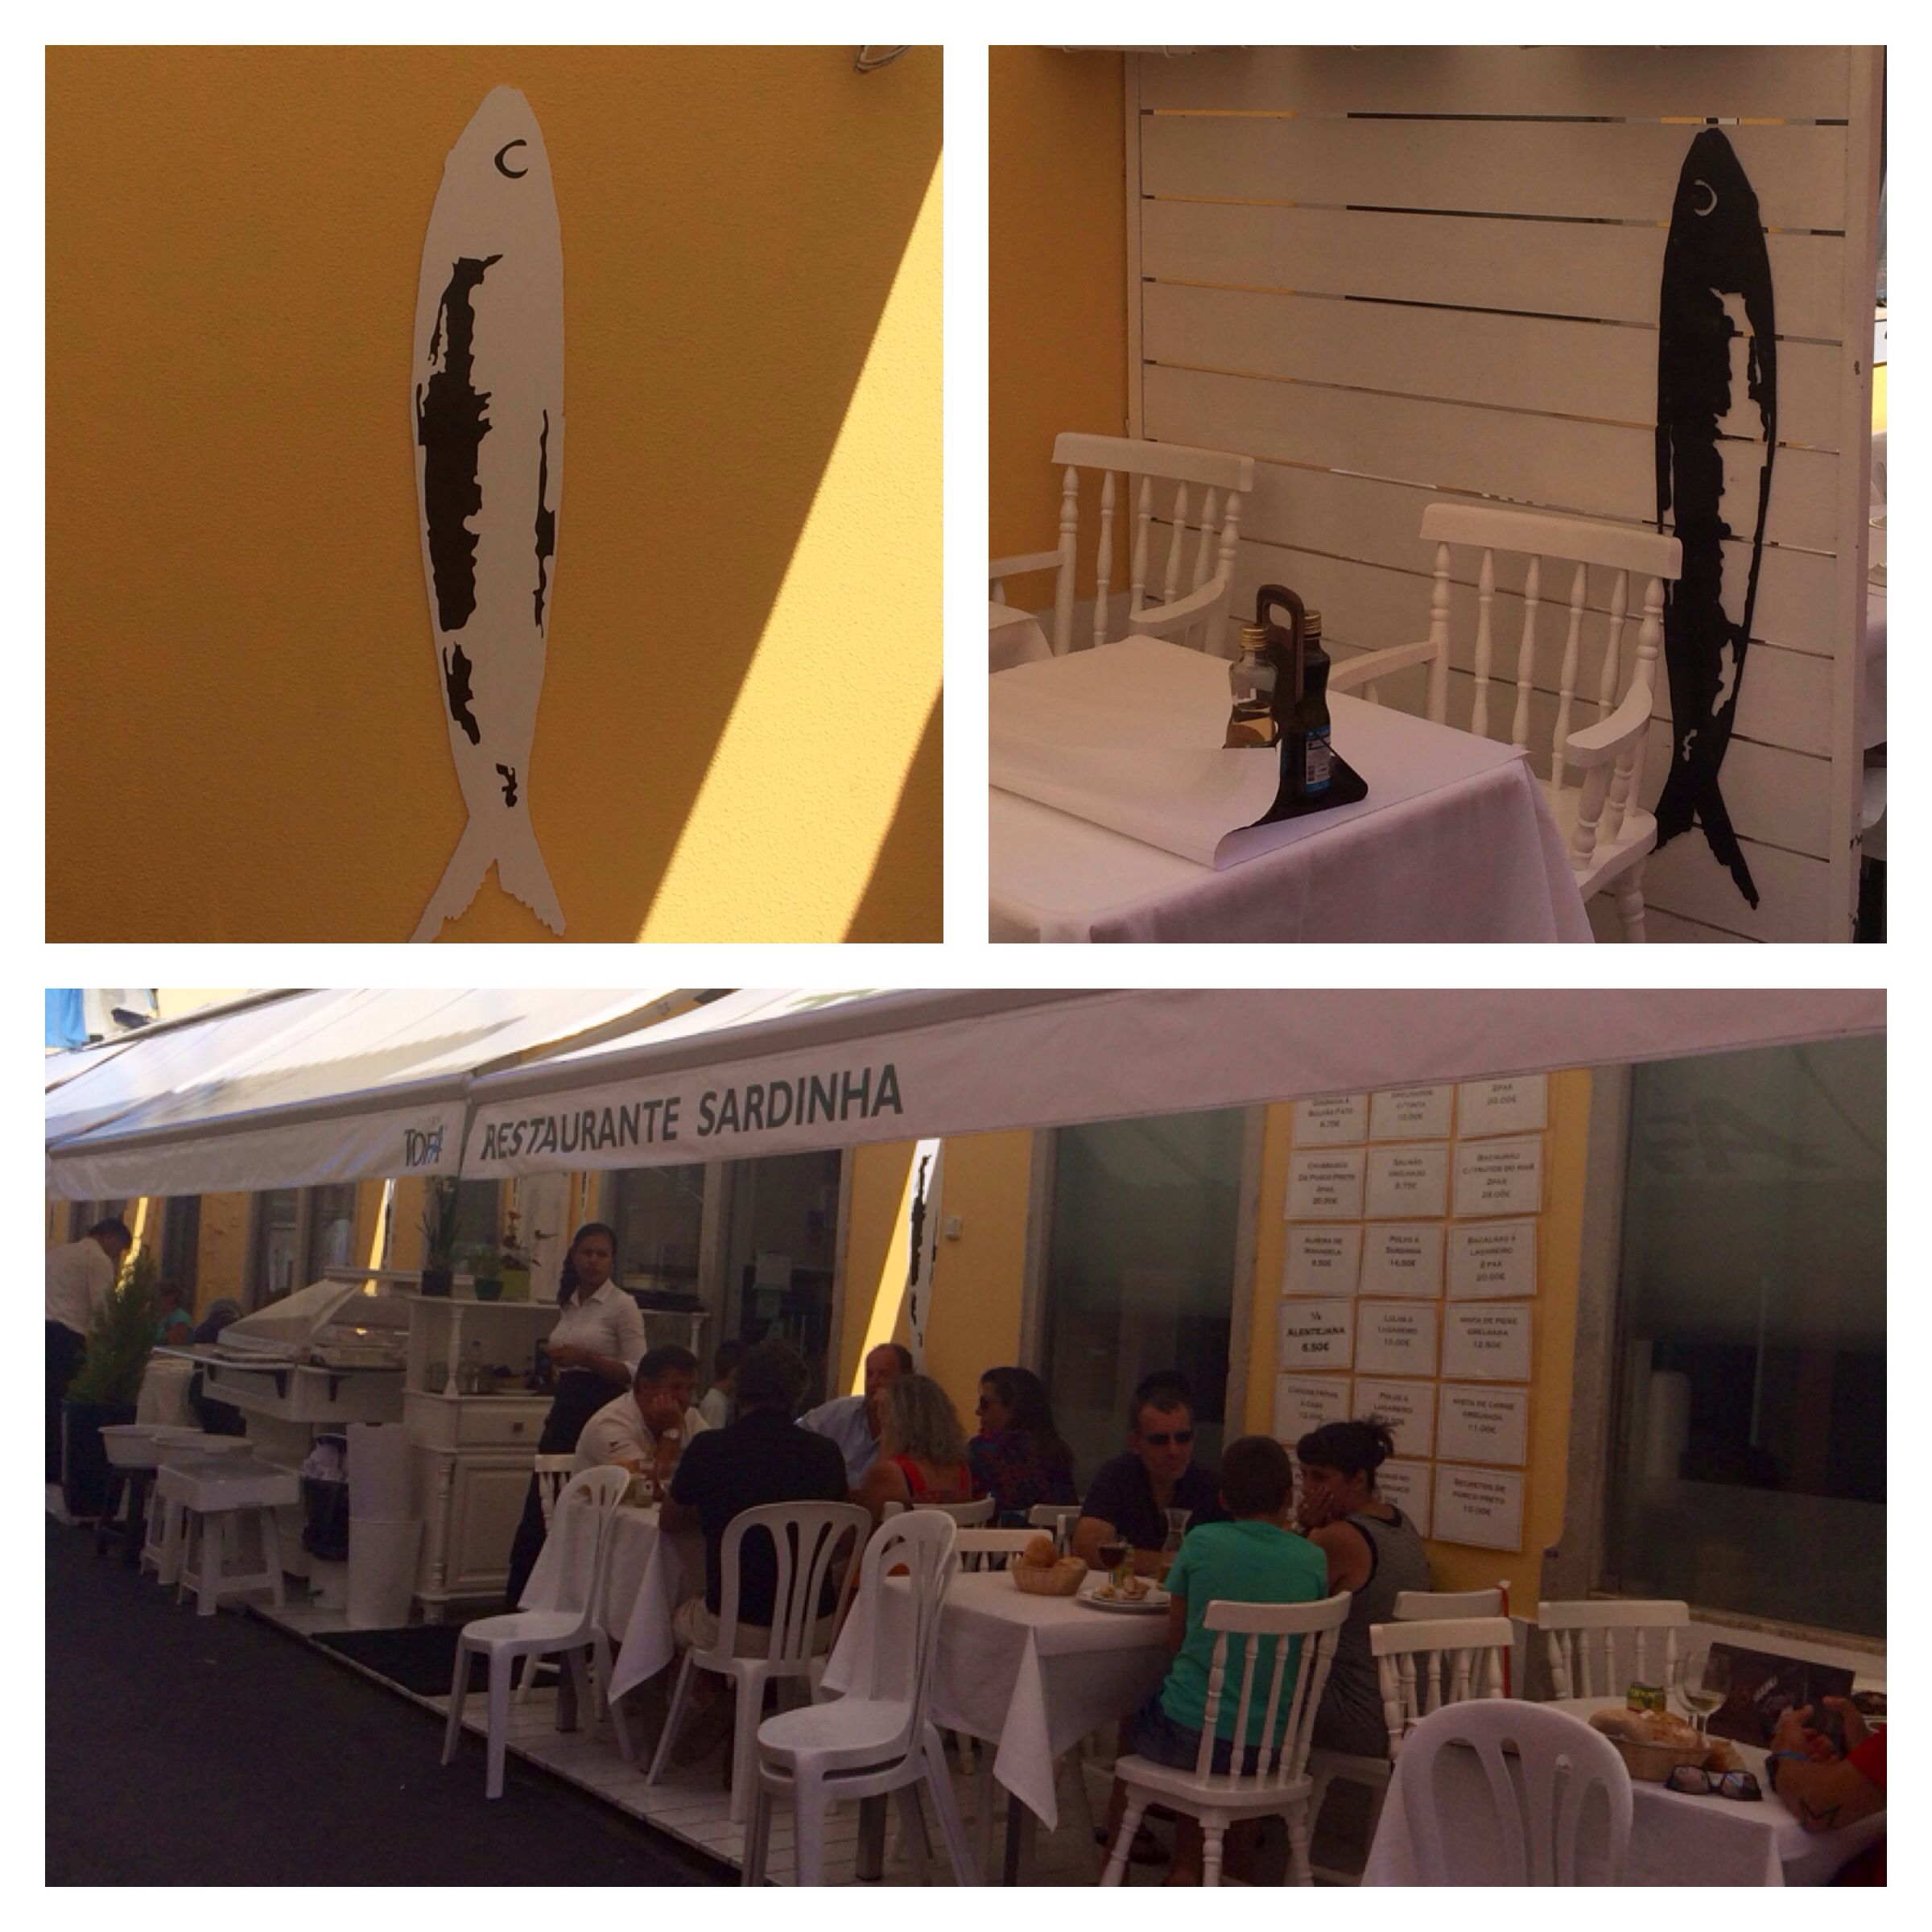 Restaurante Sardinha Peniche Portugal Nice Restaurants Et Al  # Muebles Hoznayo Horario